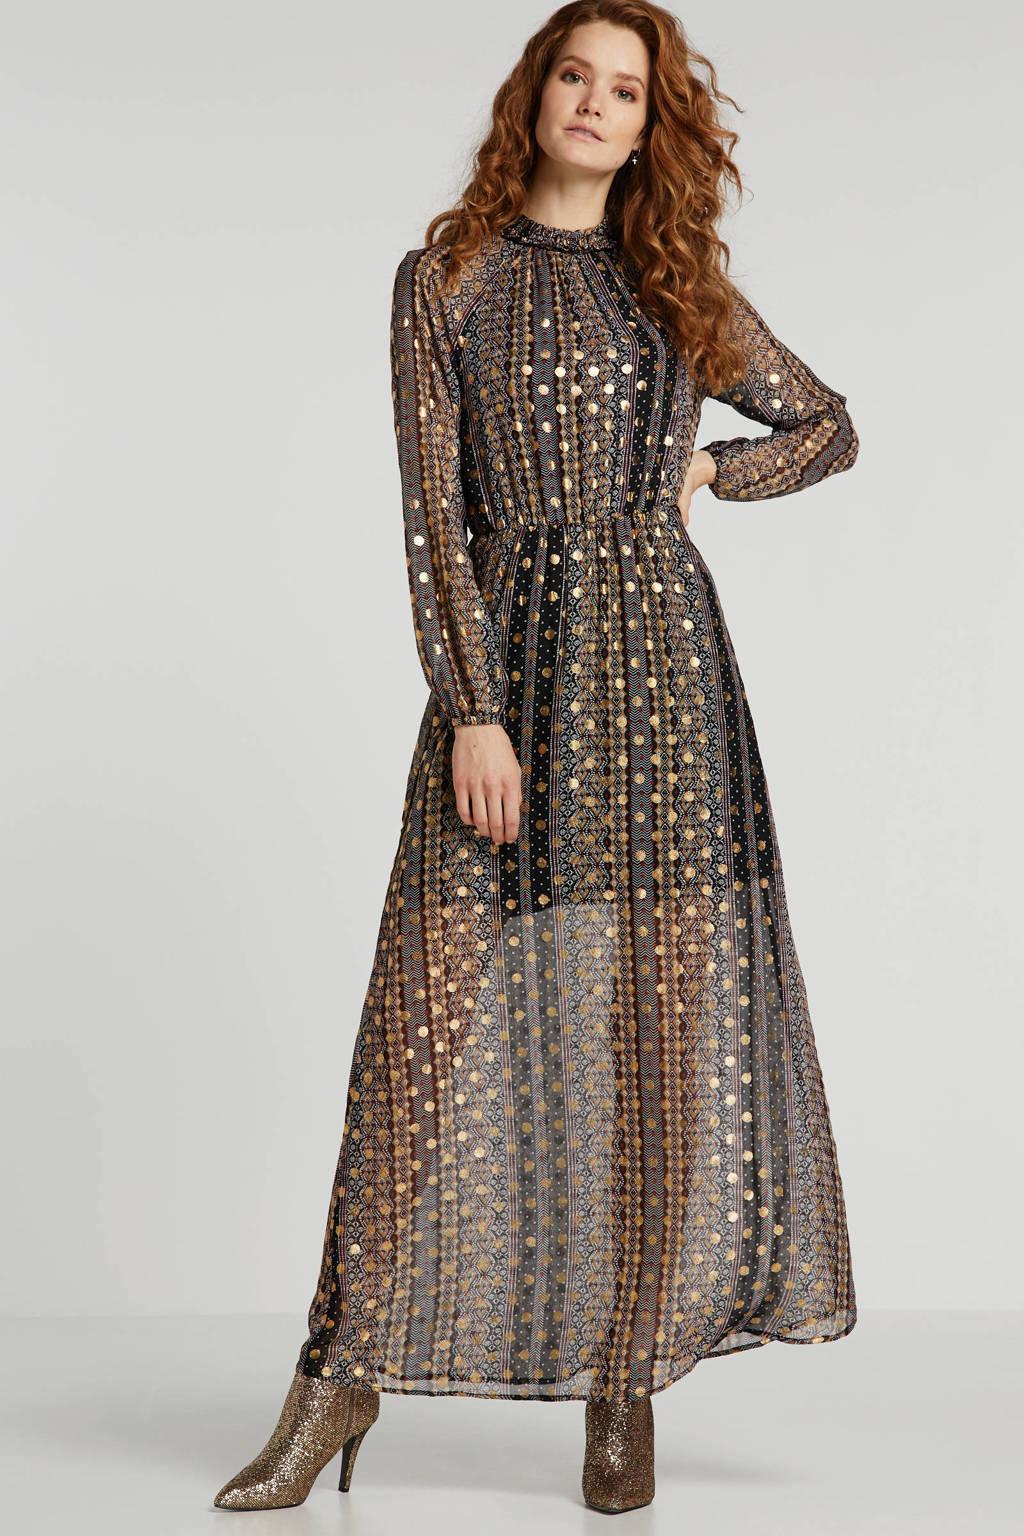 anytime maxi jurk met all-over print met goud, Zwart/camel/rood/ecru/goud